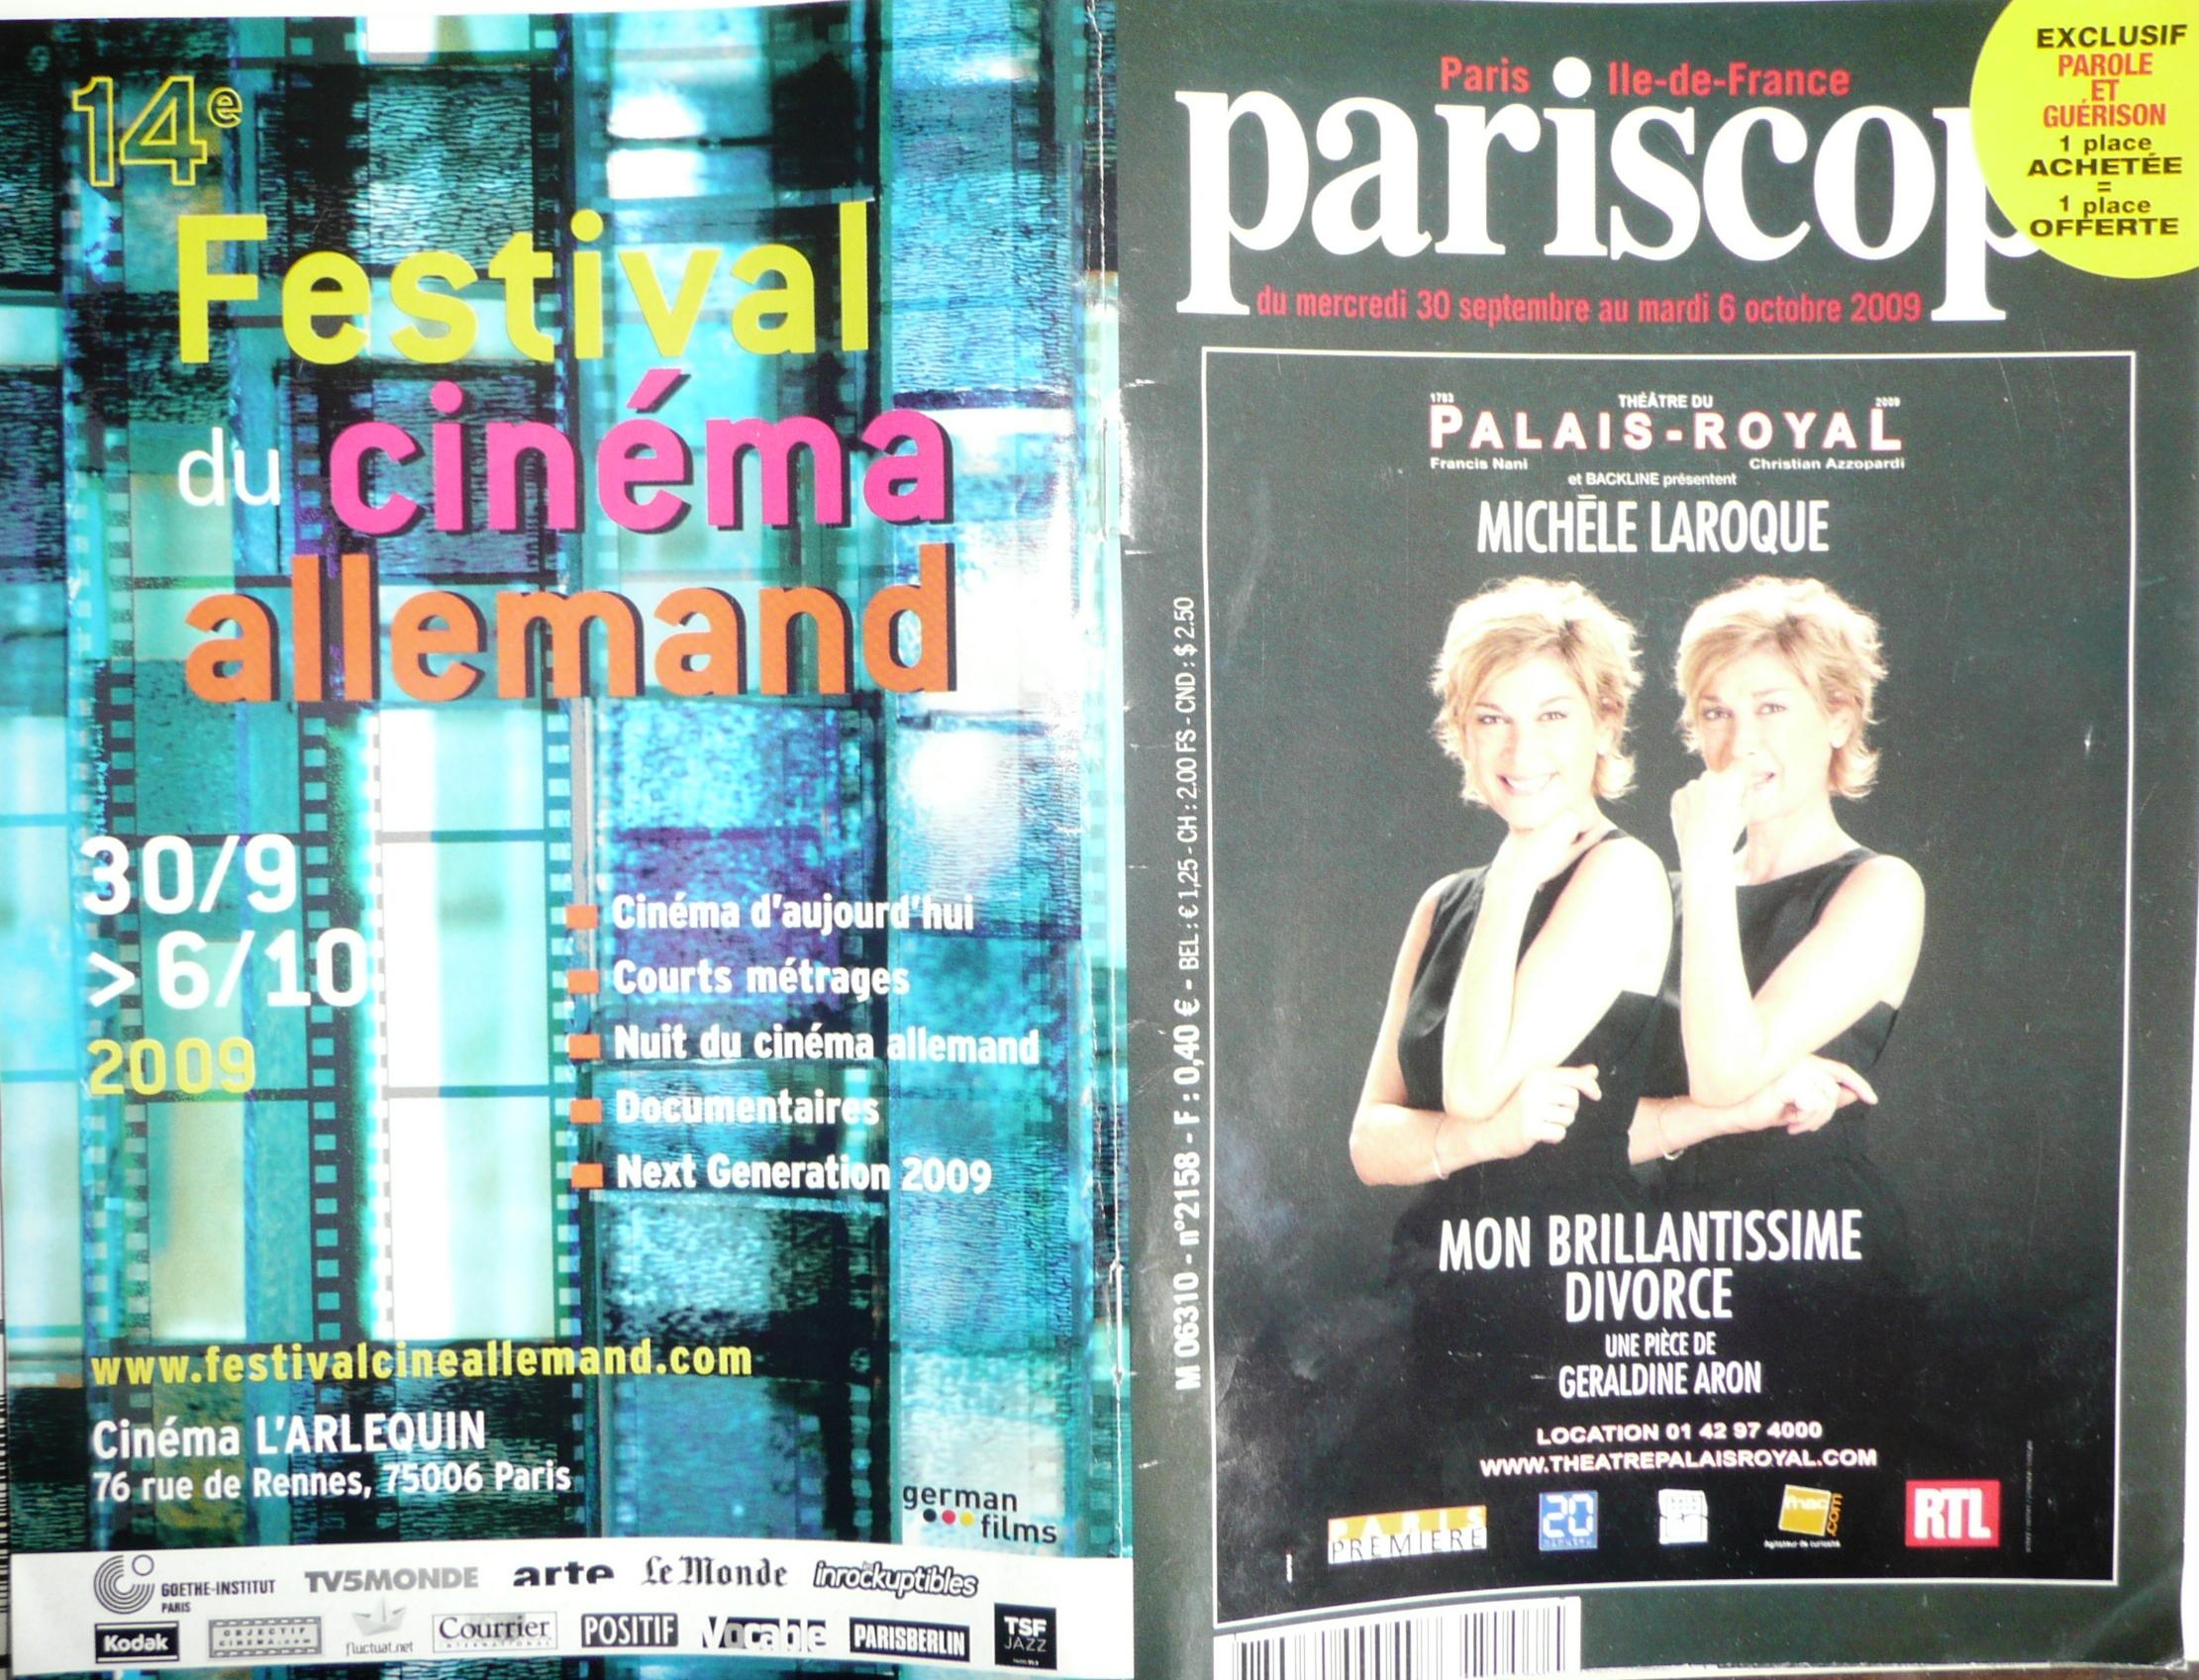 revista pariscope photo by mamcasz